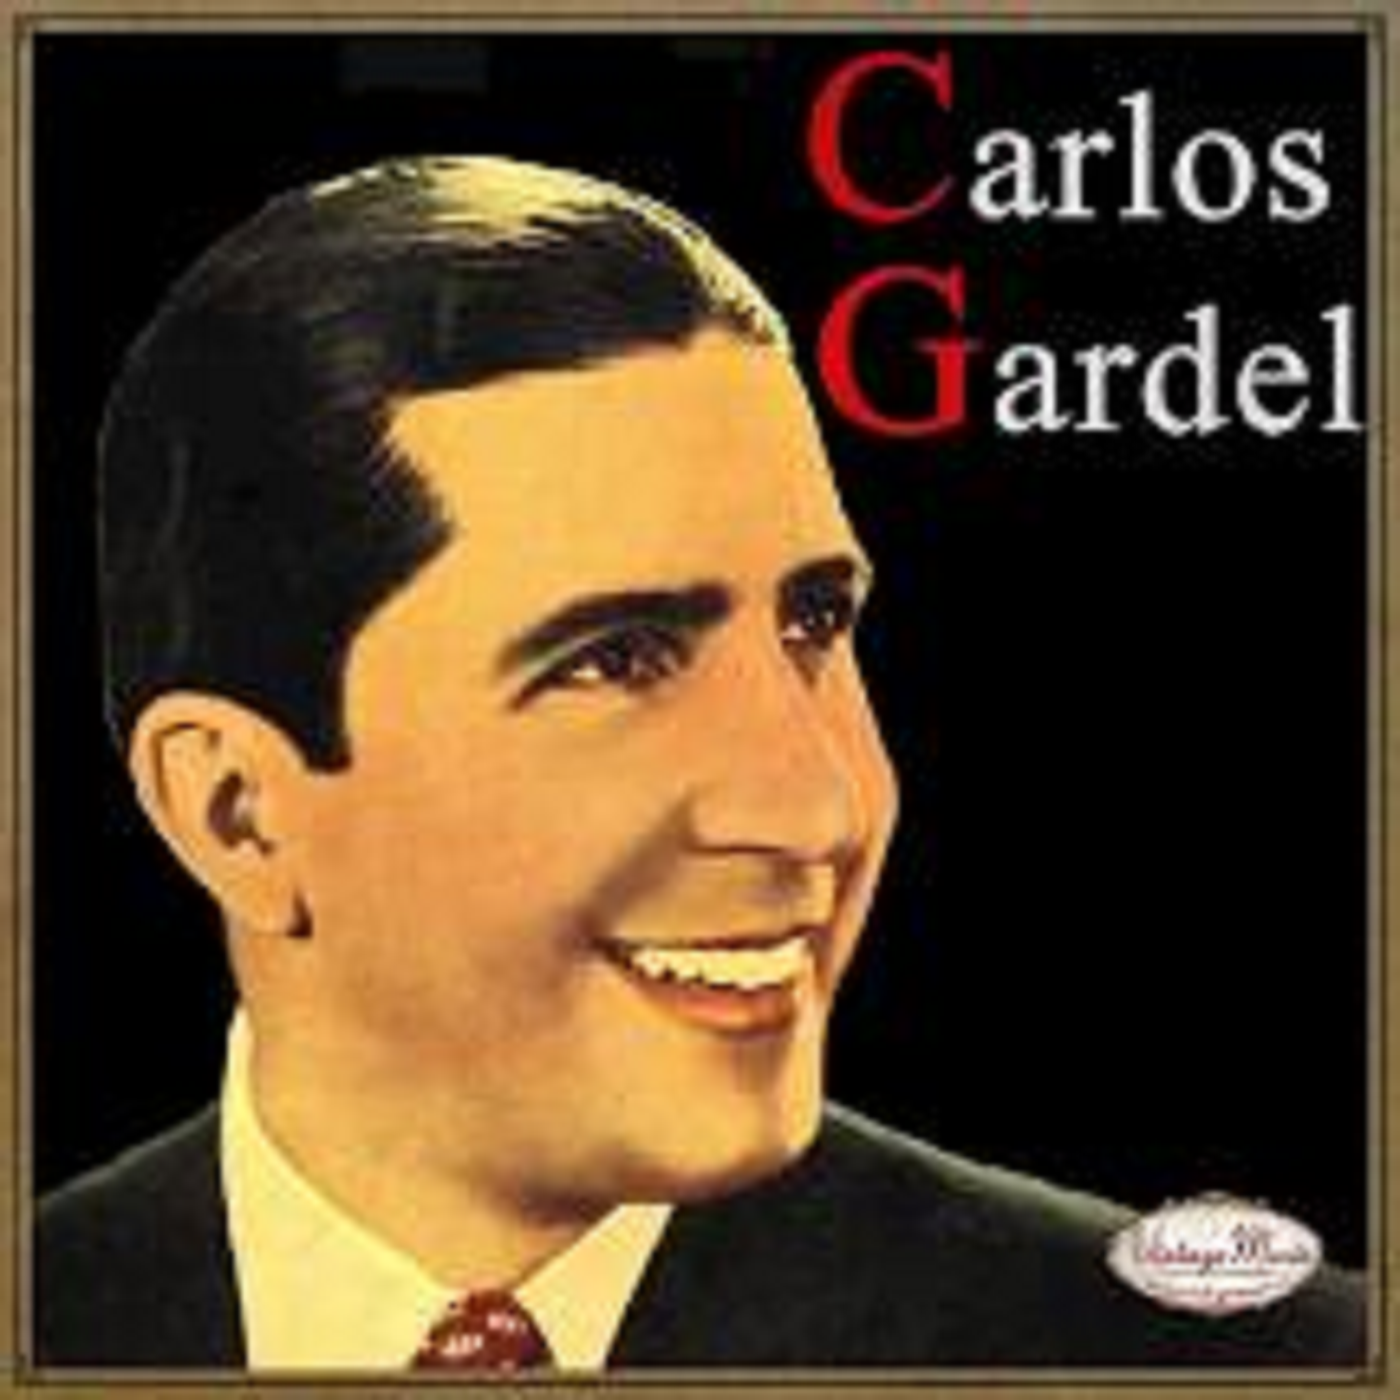 Carlos Gardel1.png